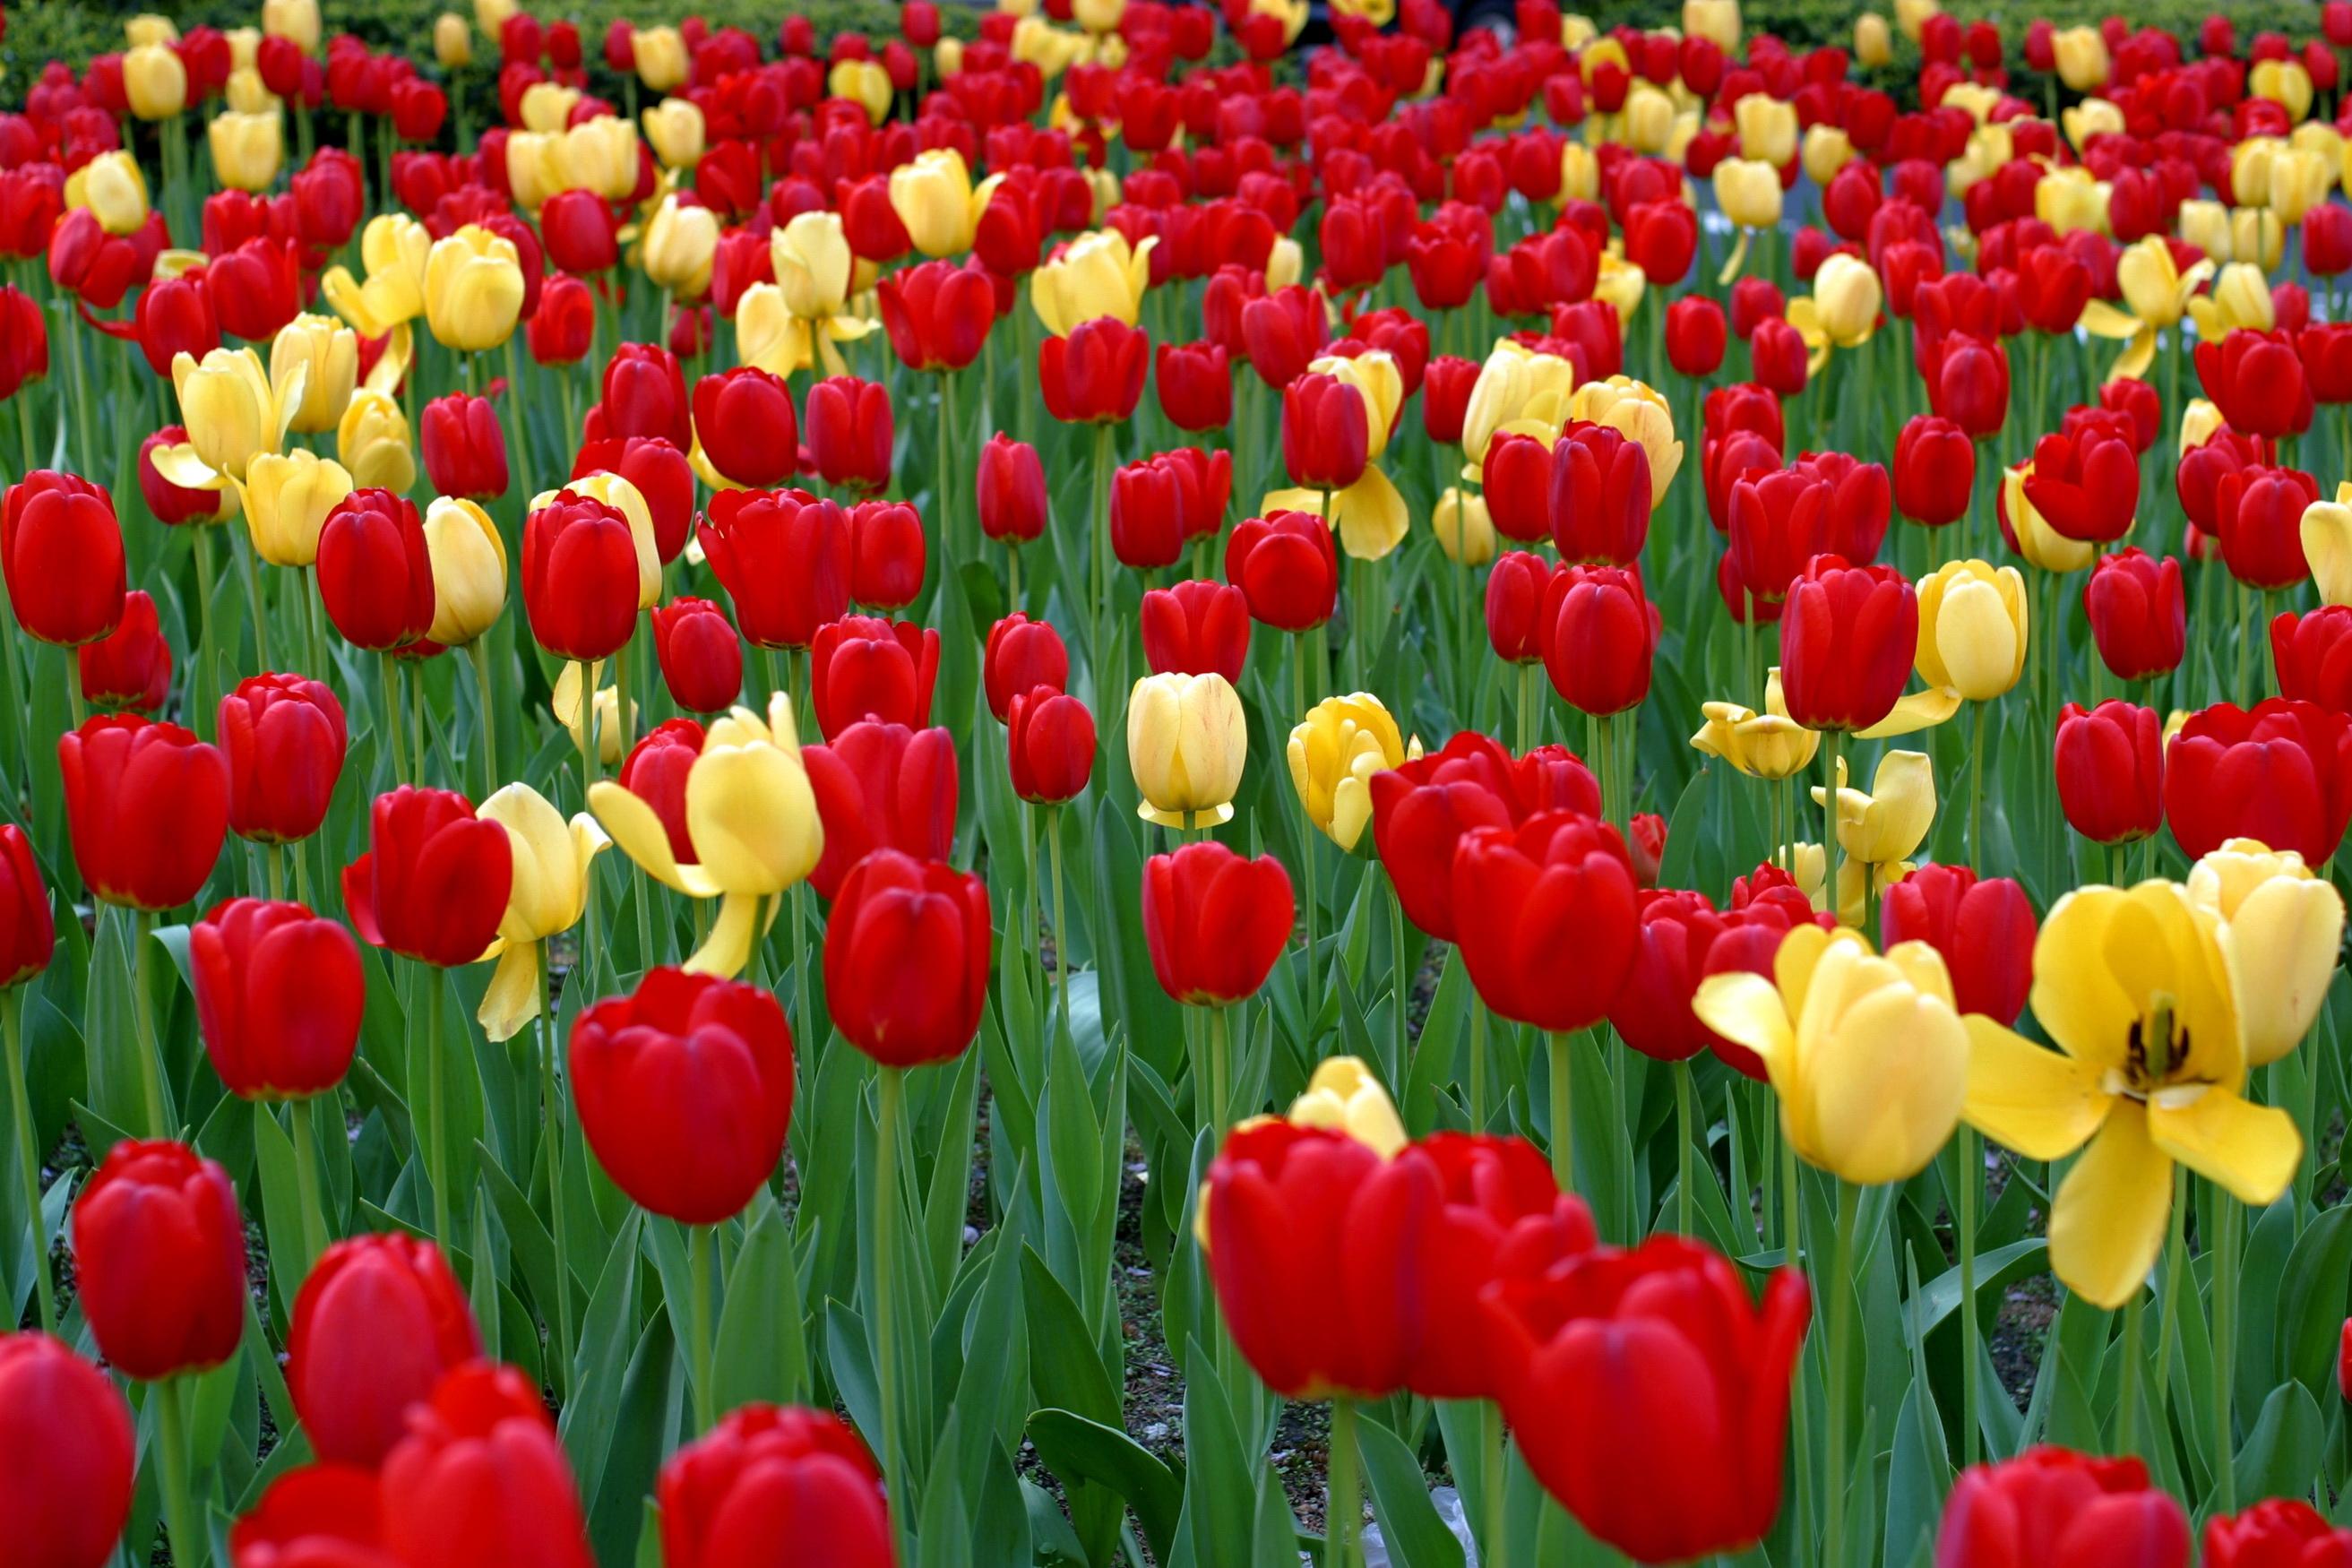 130704 descargar fondo de pantalla Flores, Verduras, Cama De Flores, Parterre, Primavera, Tulipanes: protectores de pantalla e imágenes gratis